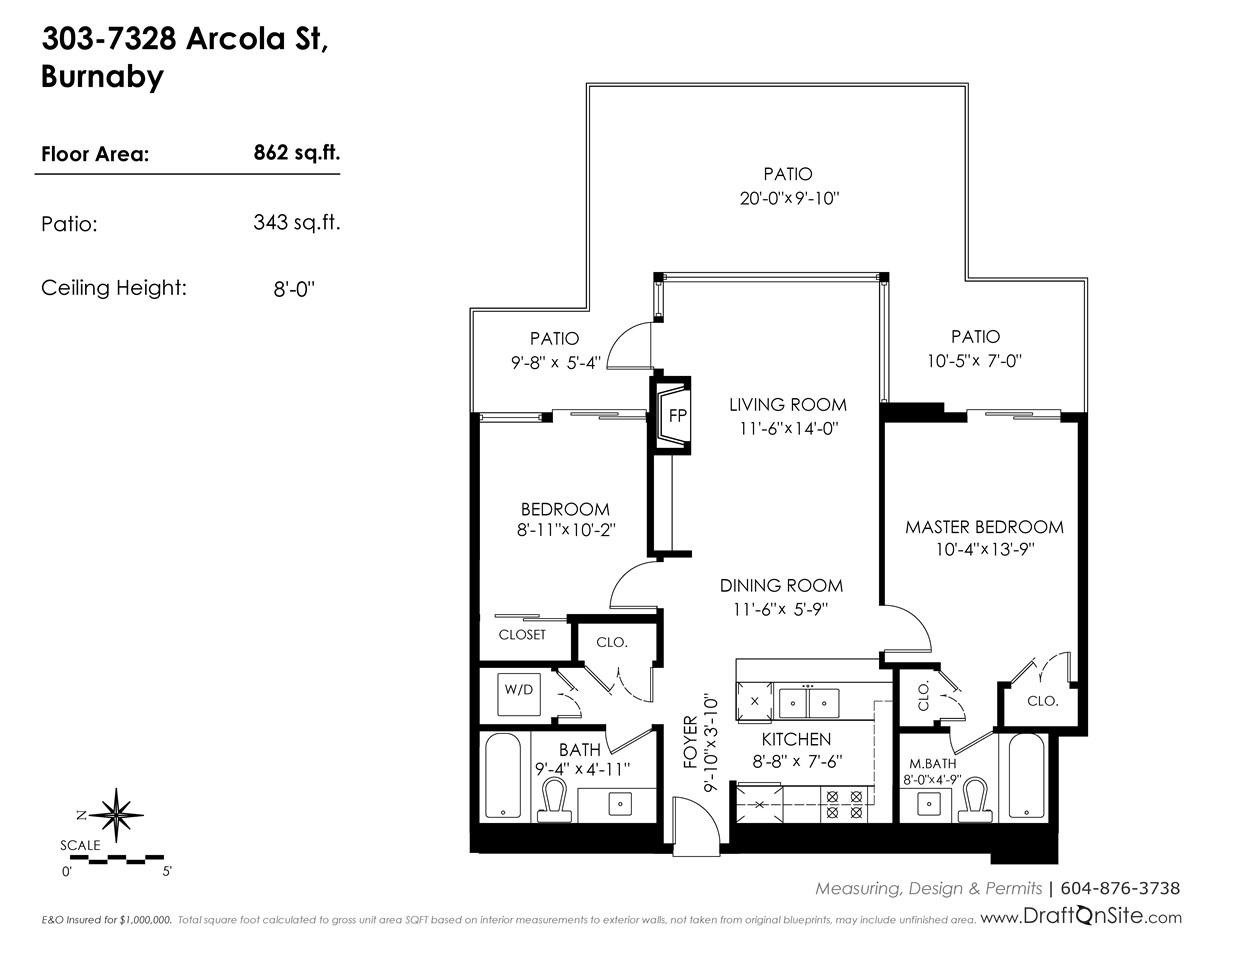 303 7328 ARCOLA STREET Burnaby, BC - 19